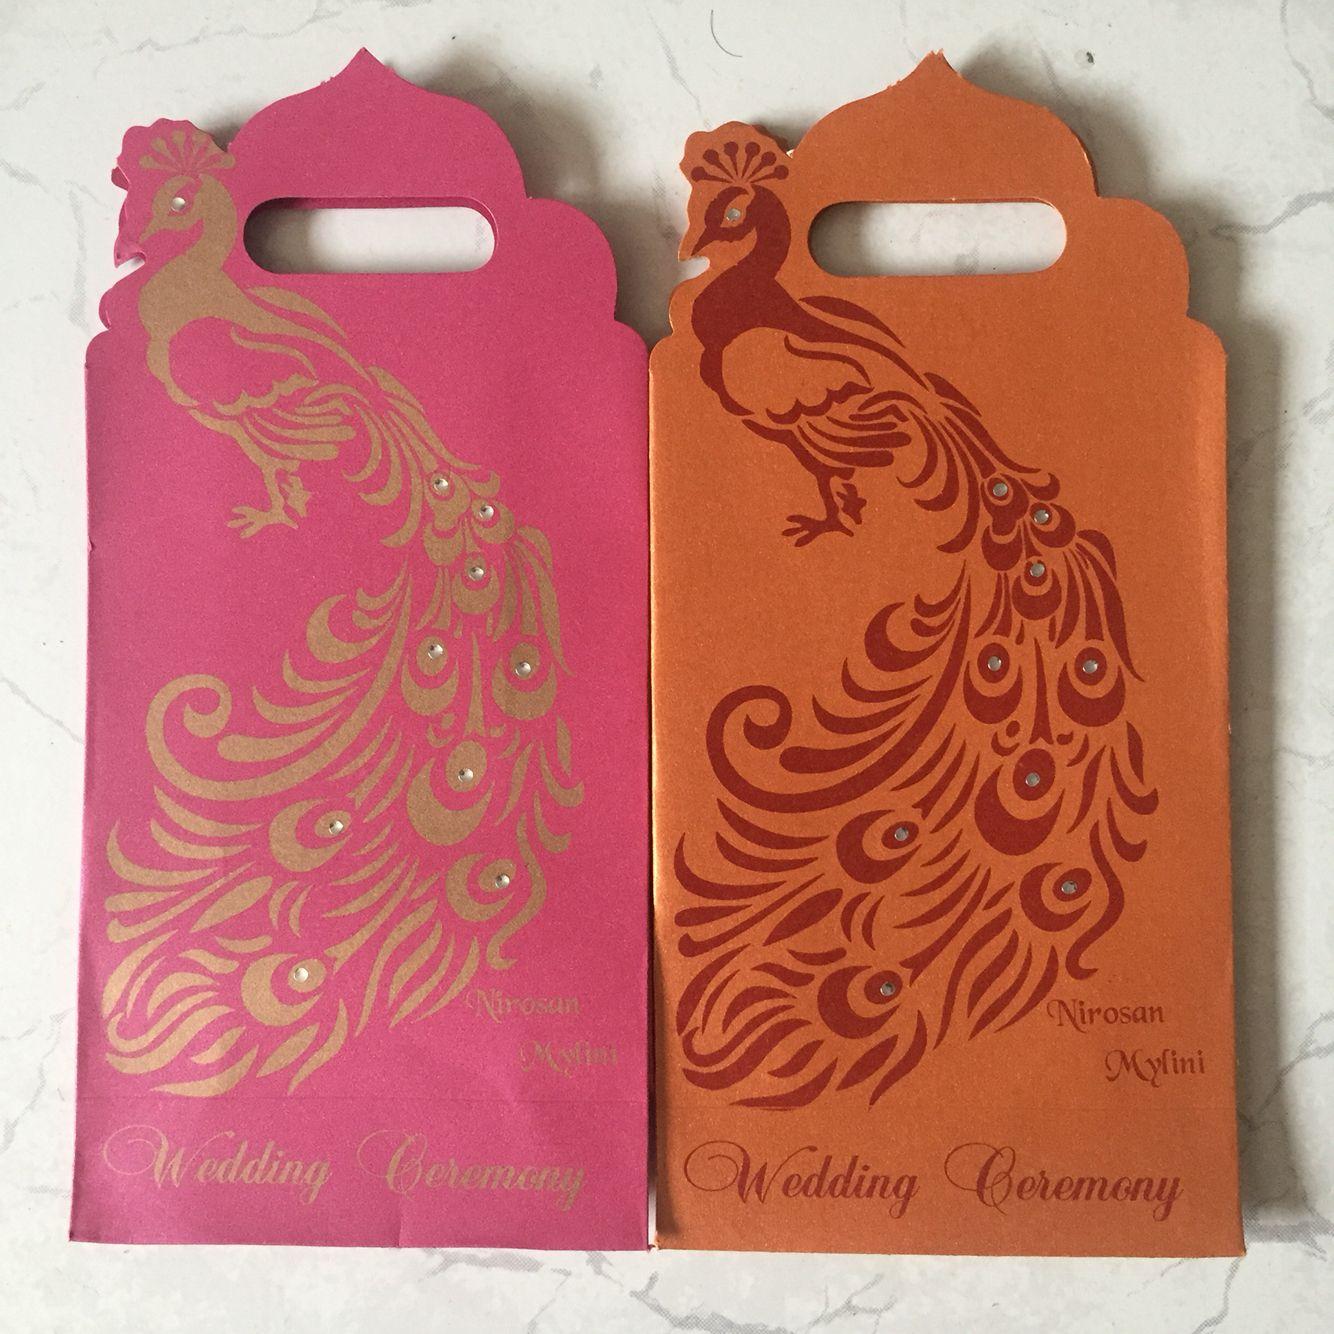 Indian wedding gift bags peacock orange & pink | My Tamil hindou ...